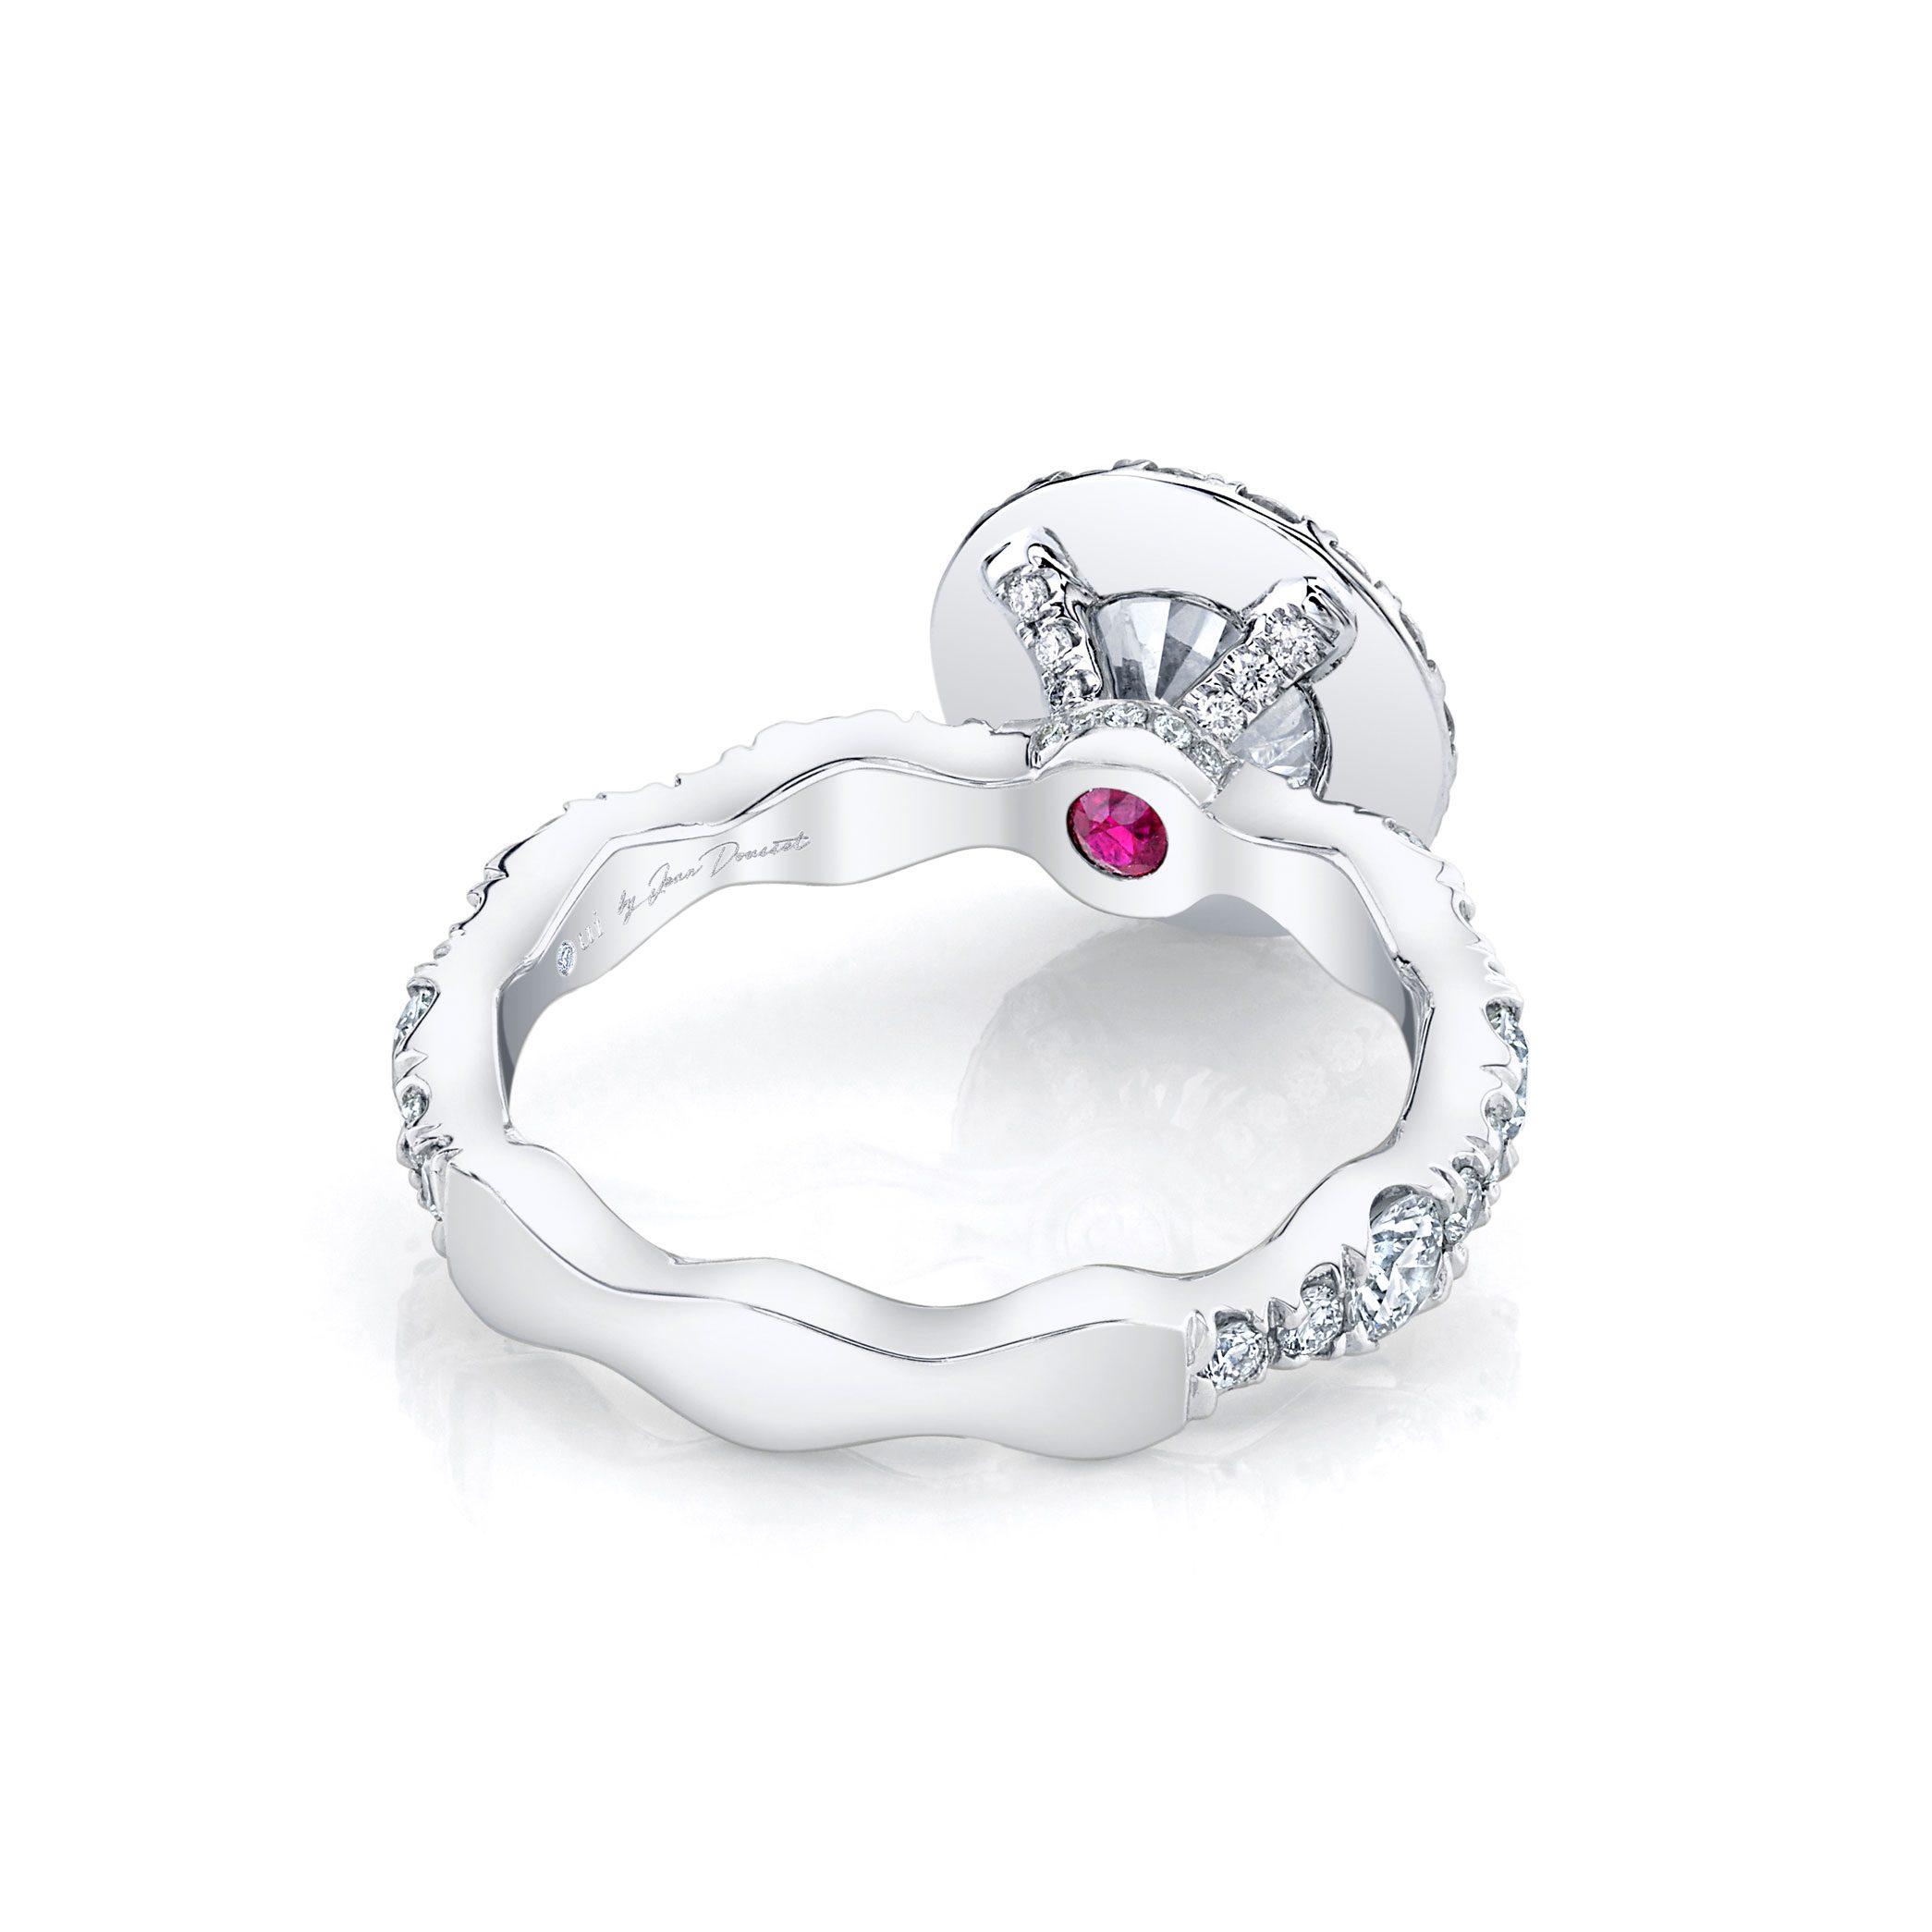 Yvonne Seamless Halo® Round Brilliant Engagement Ring 18k White Gold Back Shot